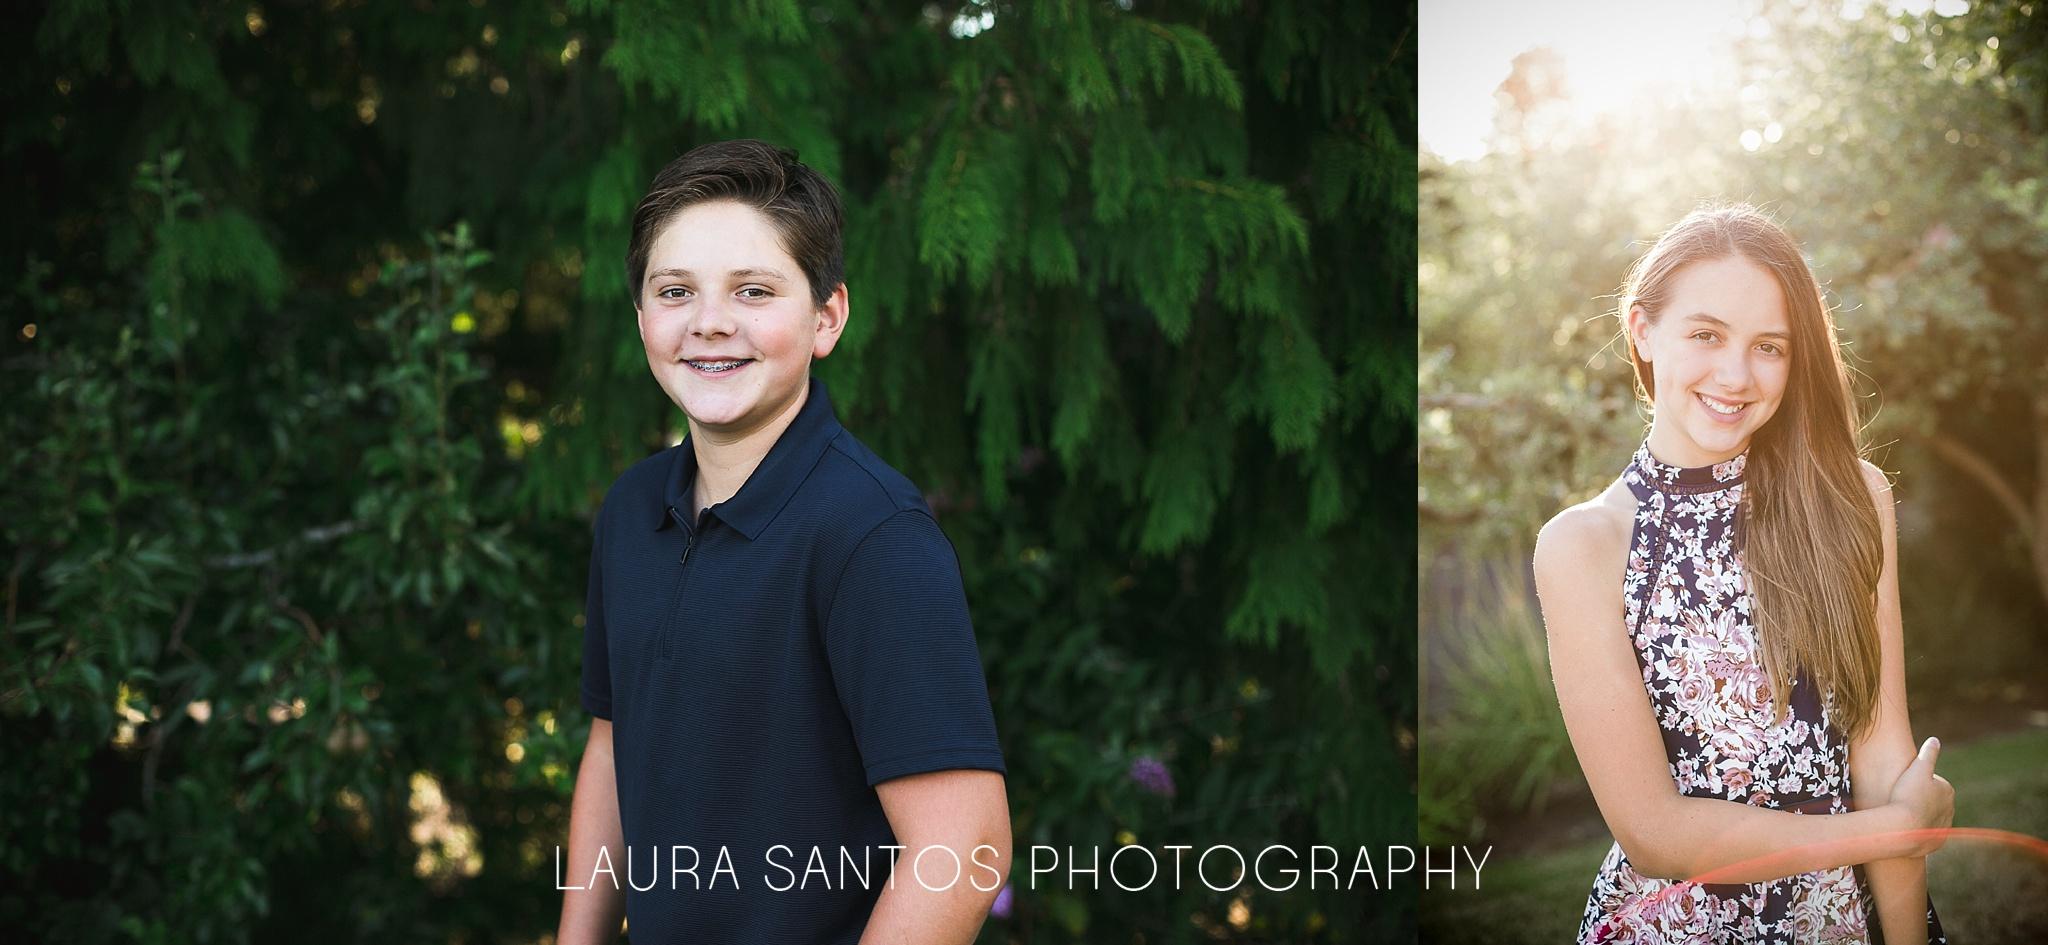 Laura Santos Photography Portland Oregon Family Photographer_0128.jpg